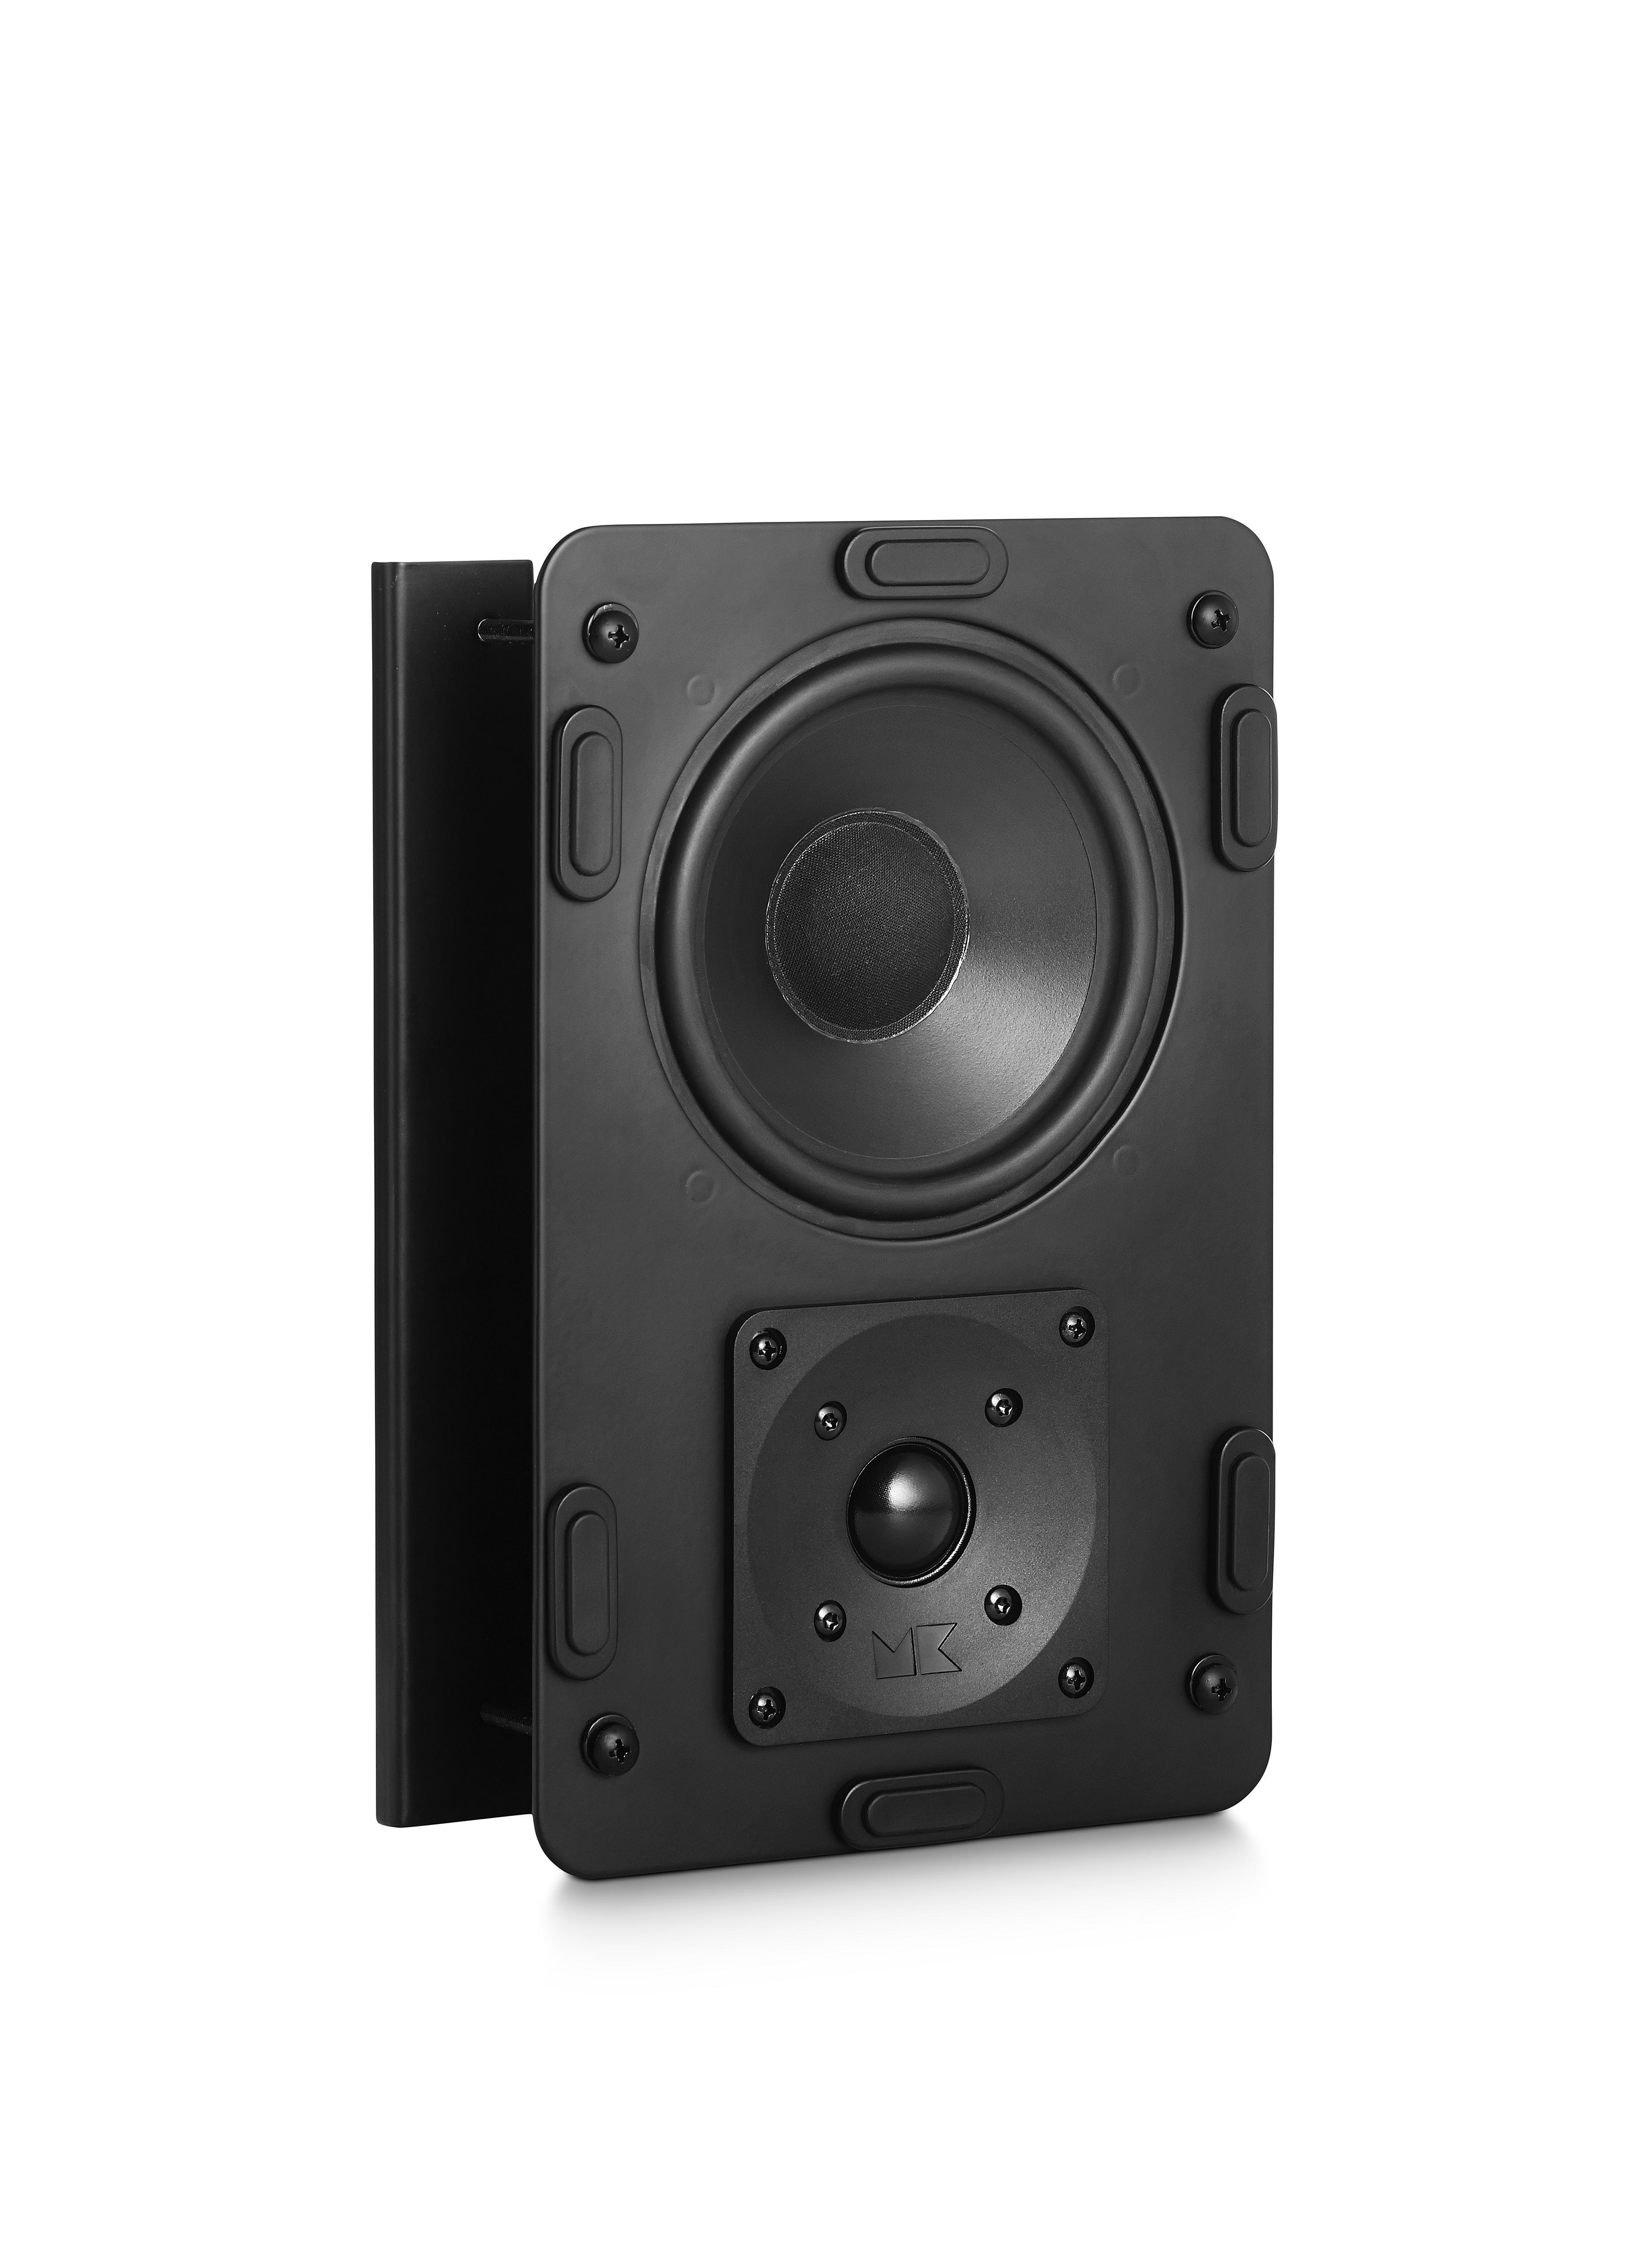 M&K Sound IW-85 beepithato hangfal eredeti